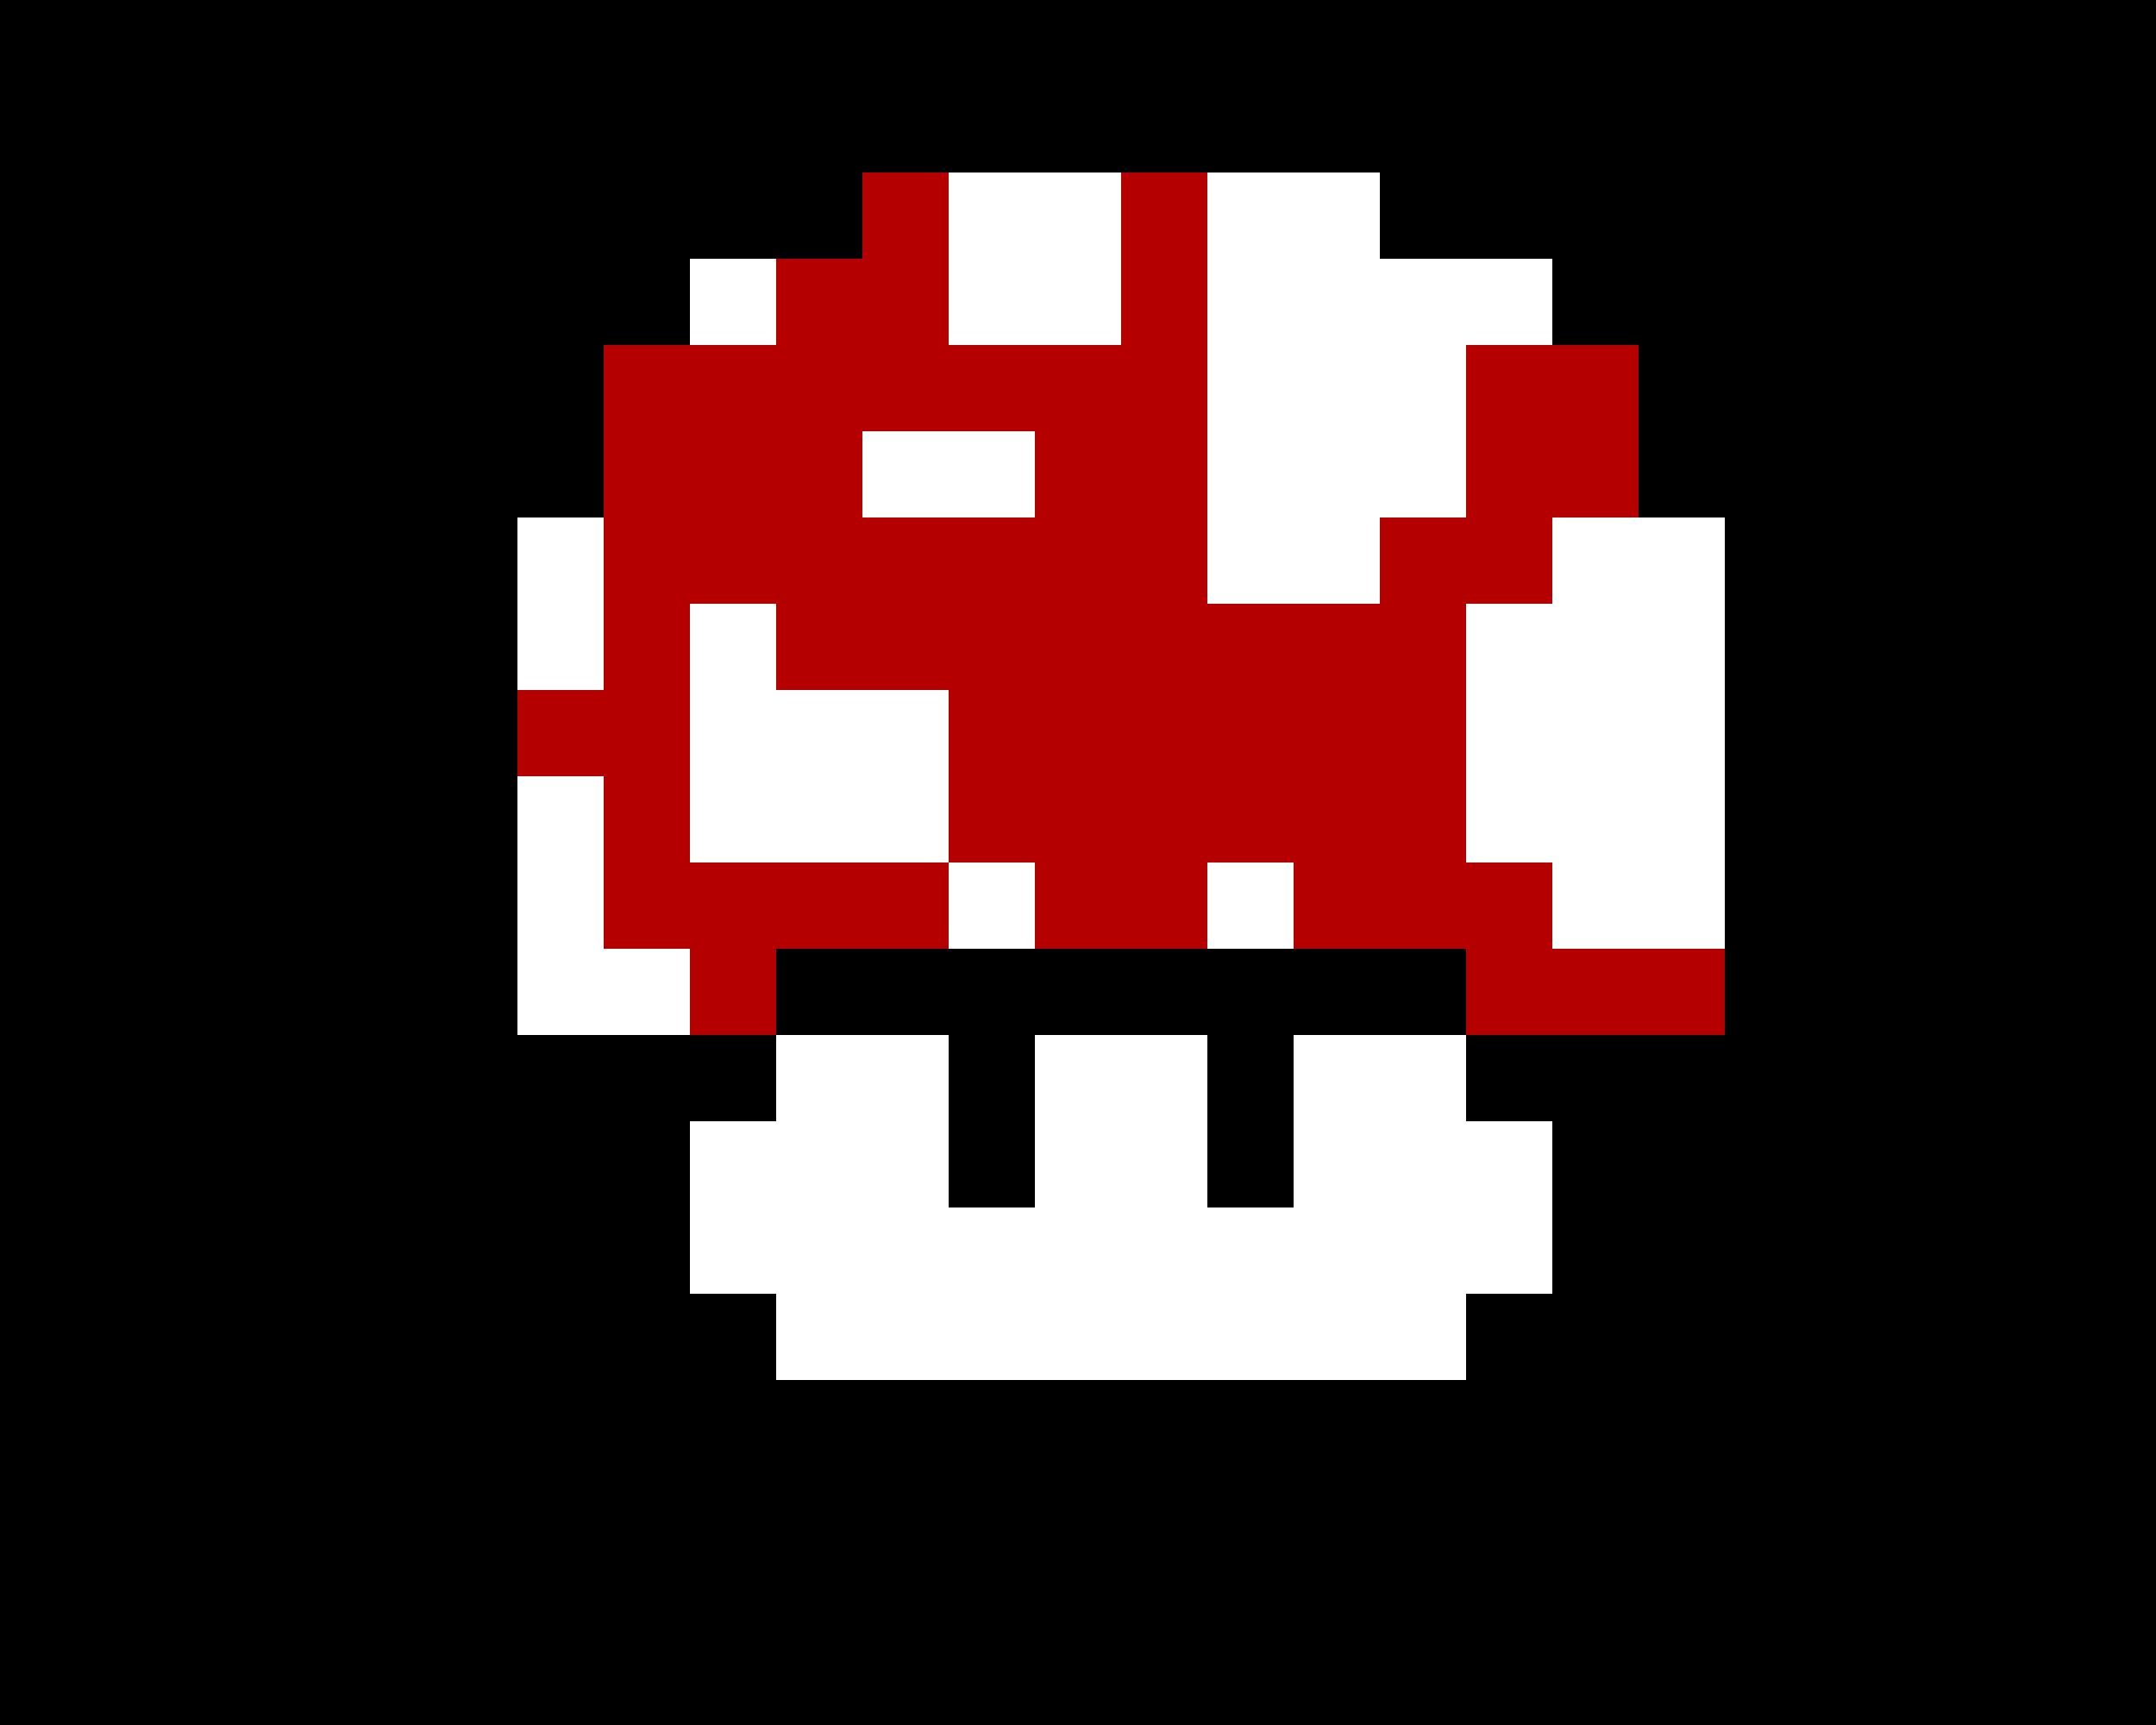 mario mushroom pixel art